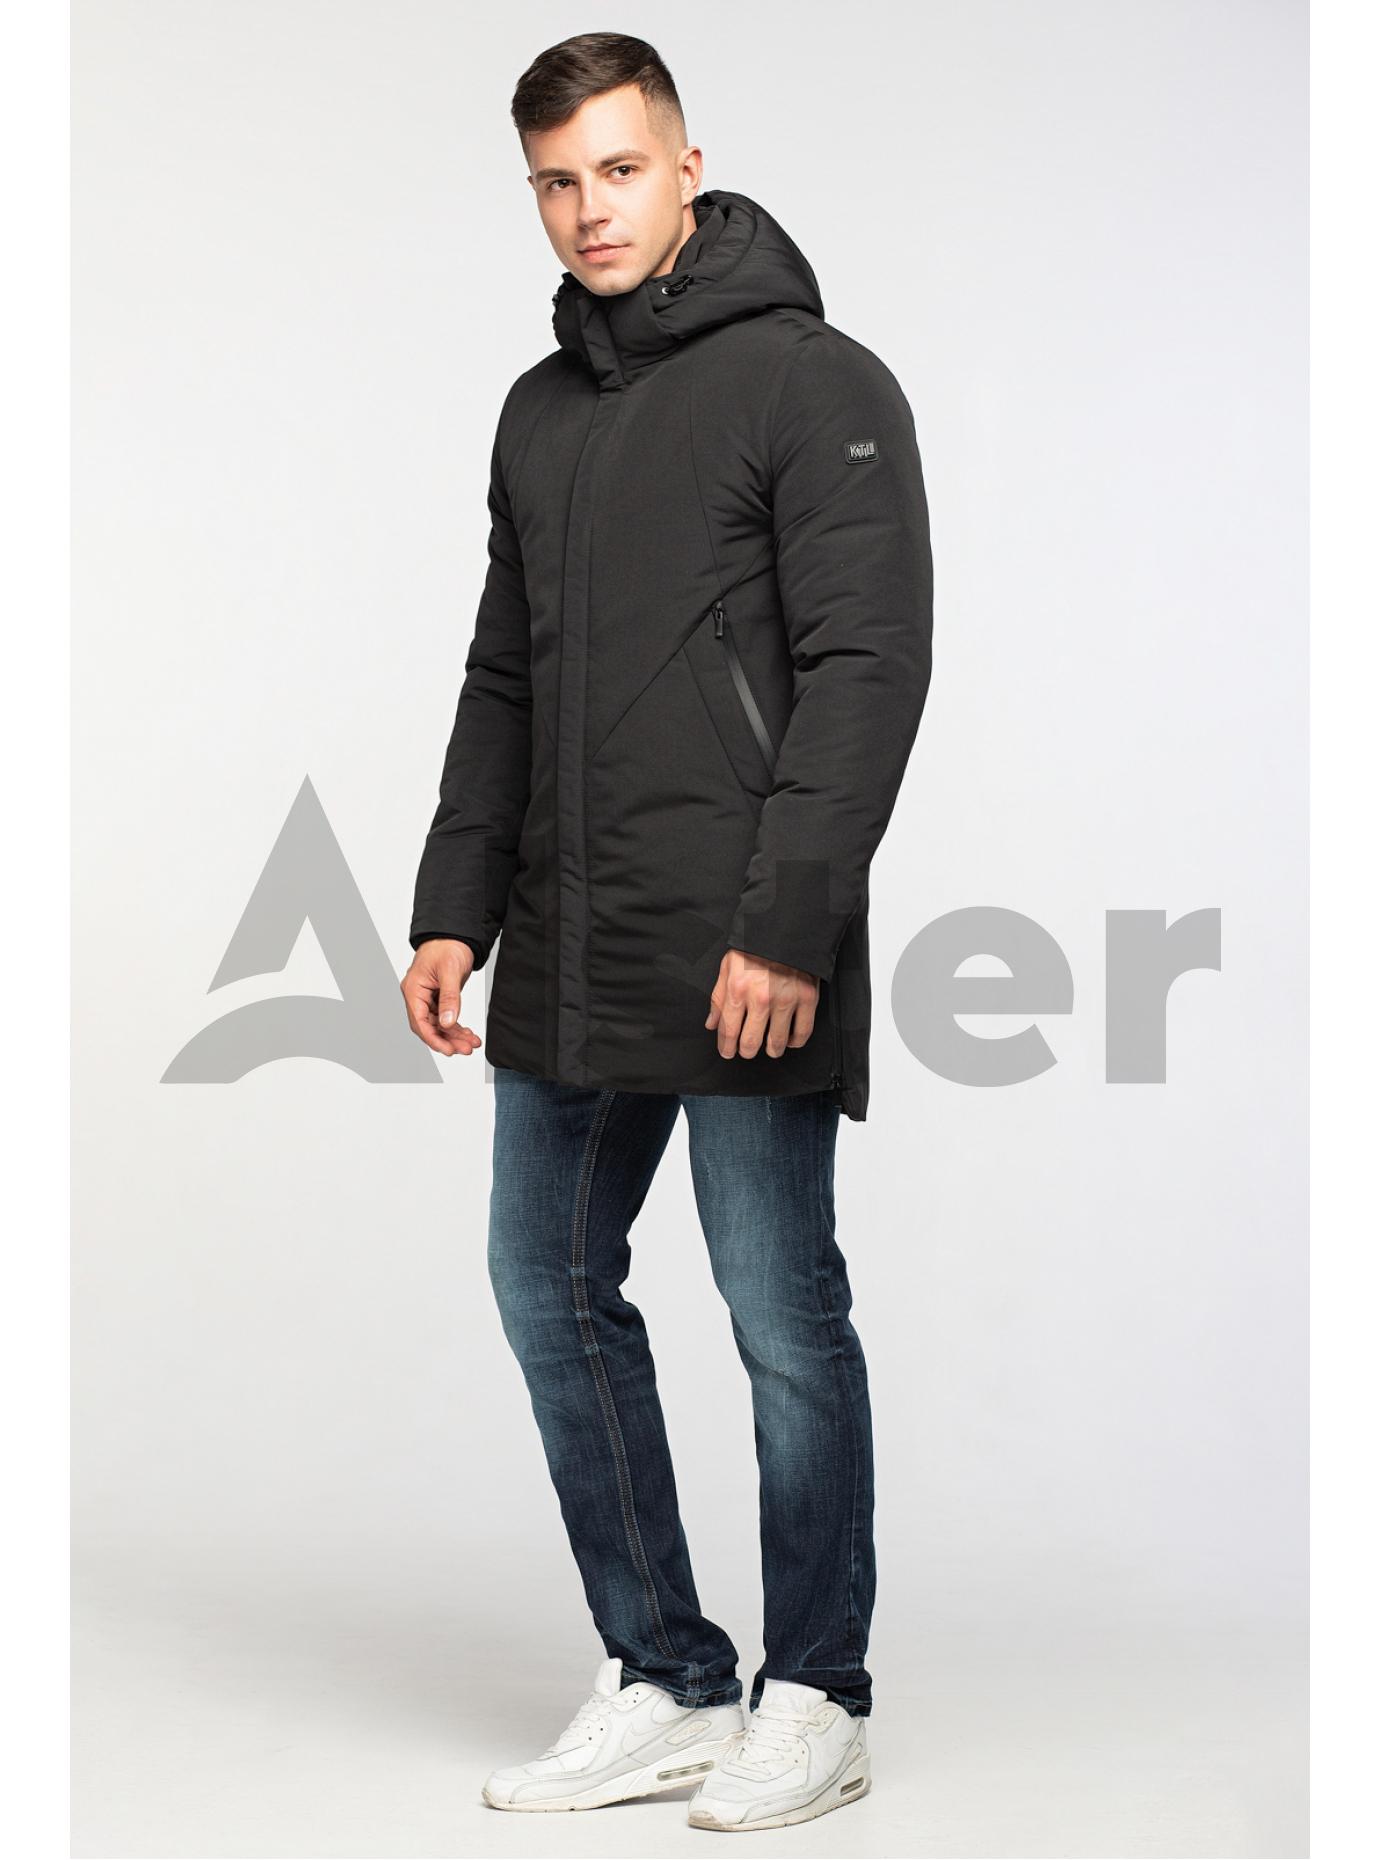 Стильна чоловіча зимова куртка Чорний 52 (02-MT21005): фото - Alster.ua